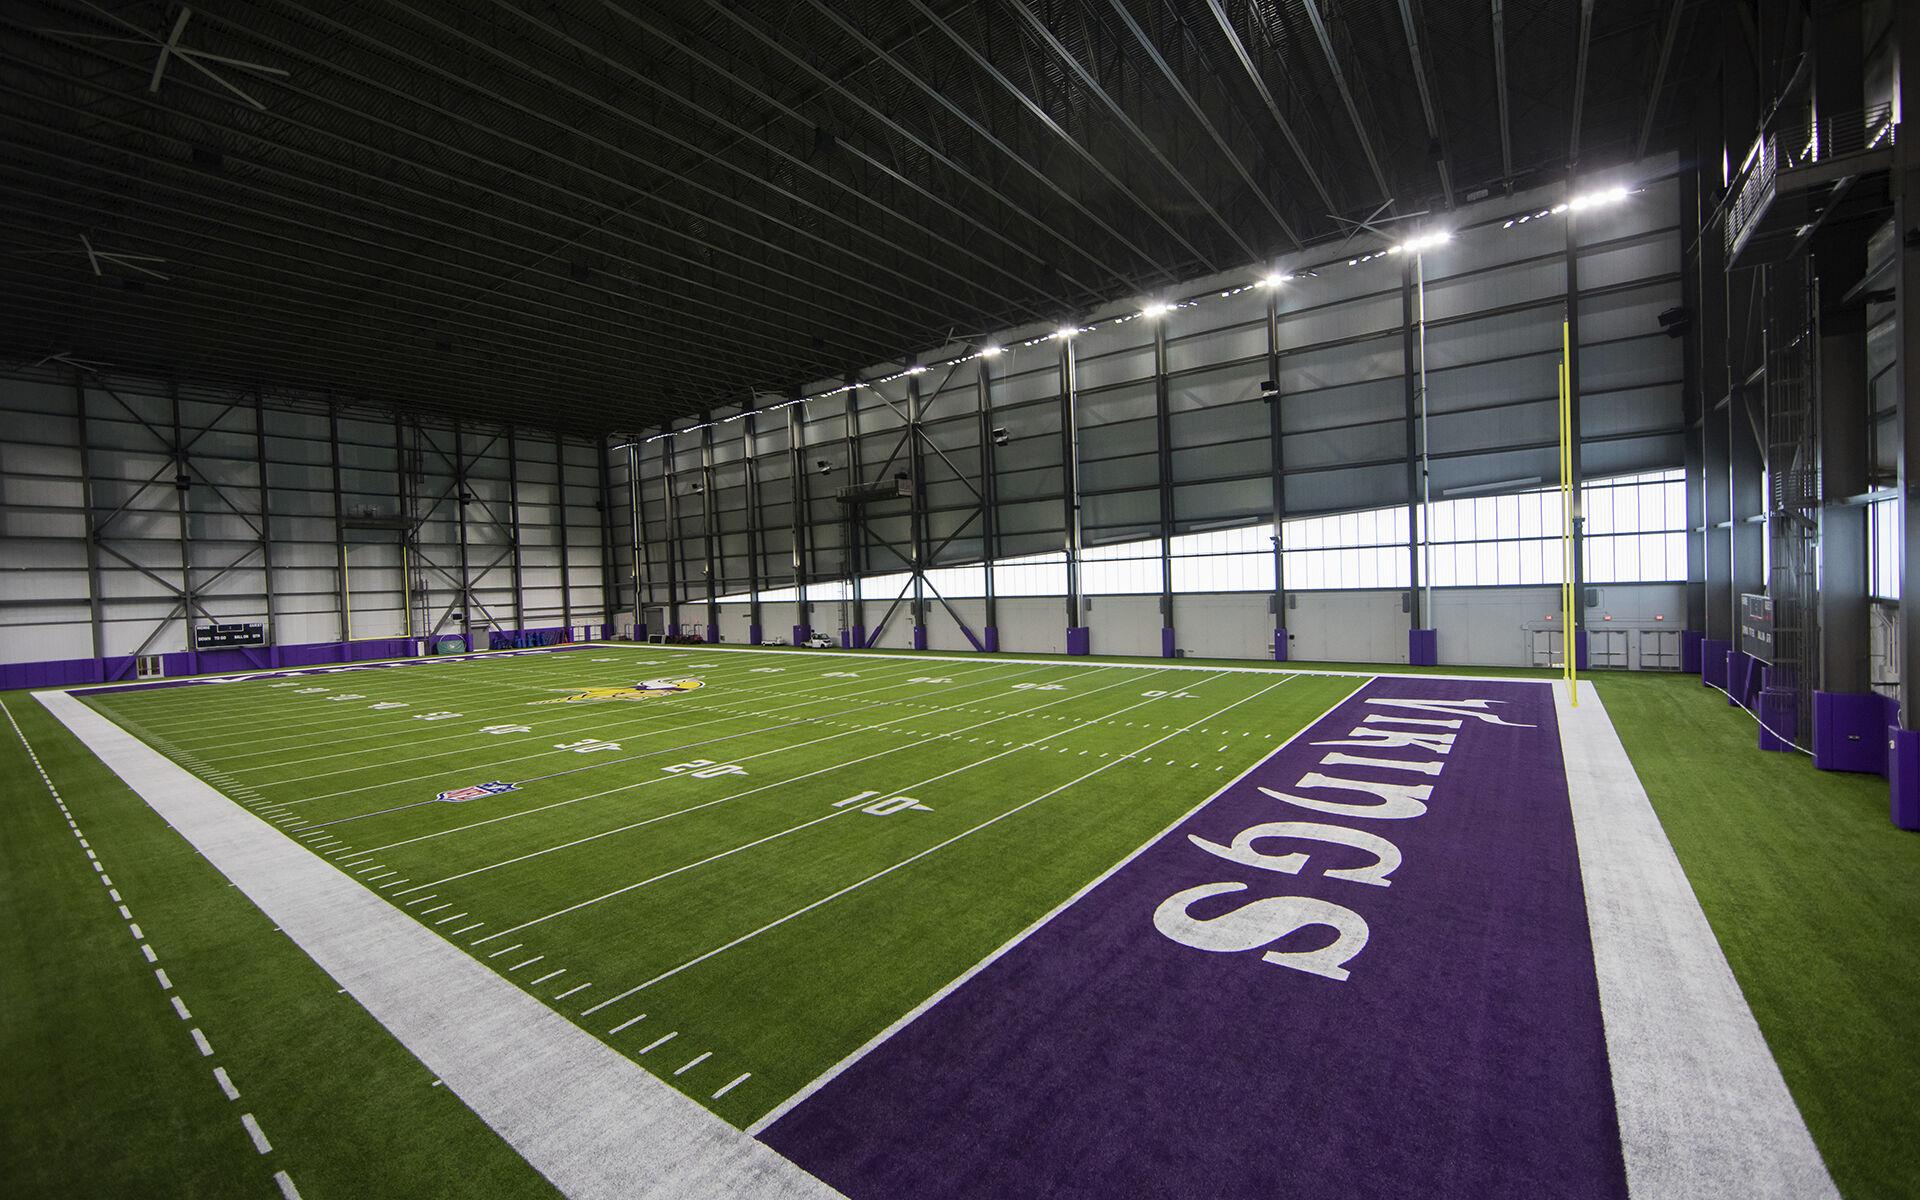 Twin Cities Orthopedics Performance Center - Minnesota Vikings